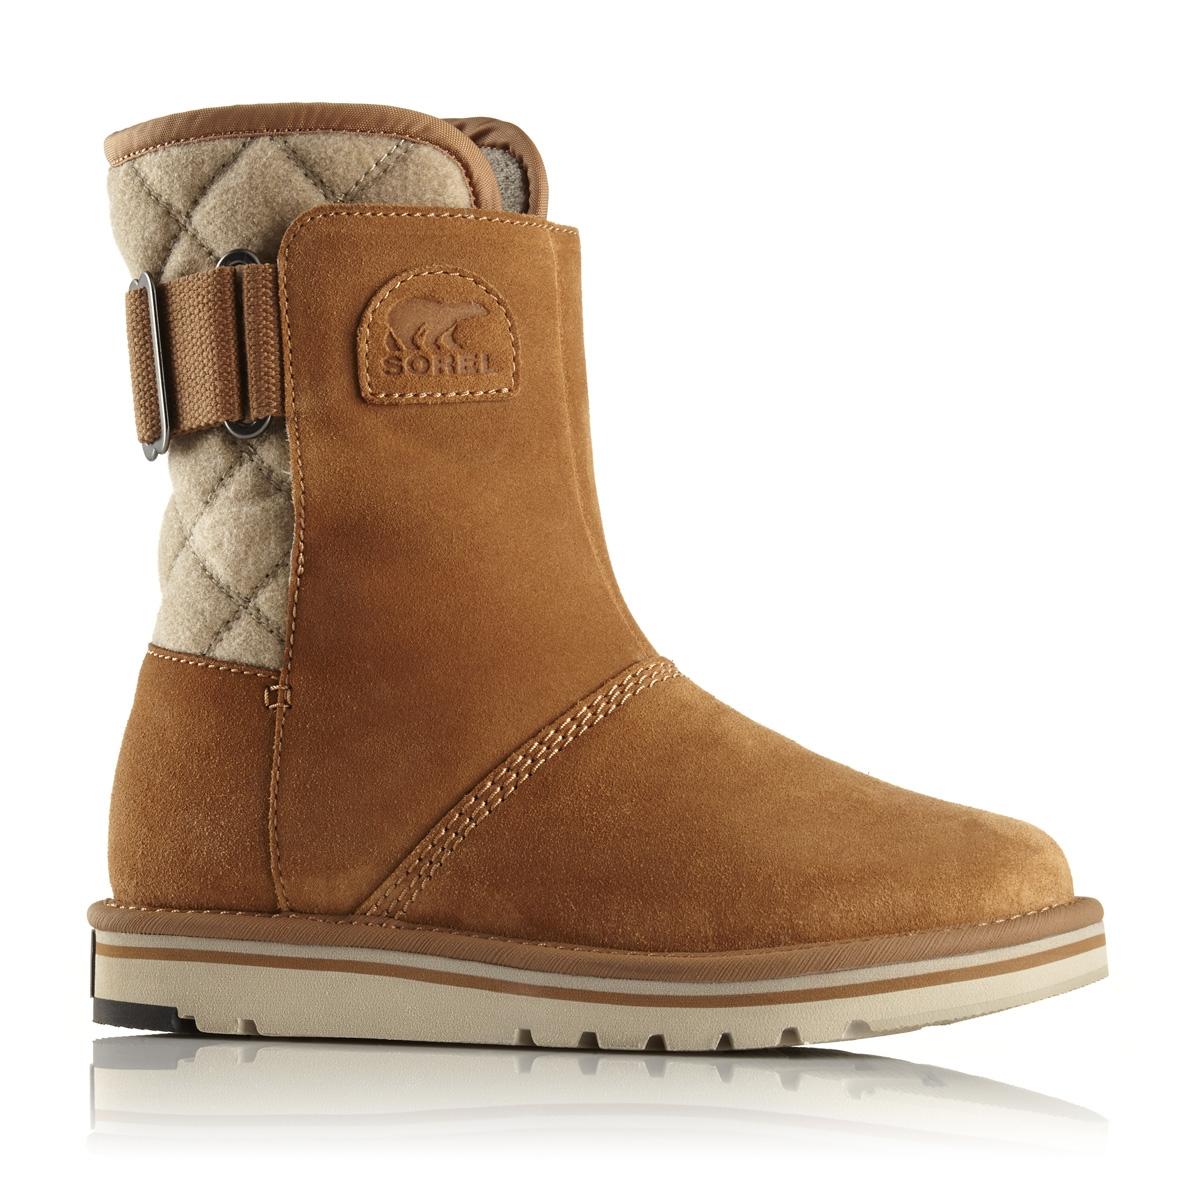 Image of Sorel Newbie Boots (Women's) - Elk/British Tan